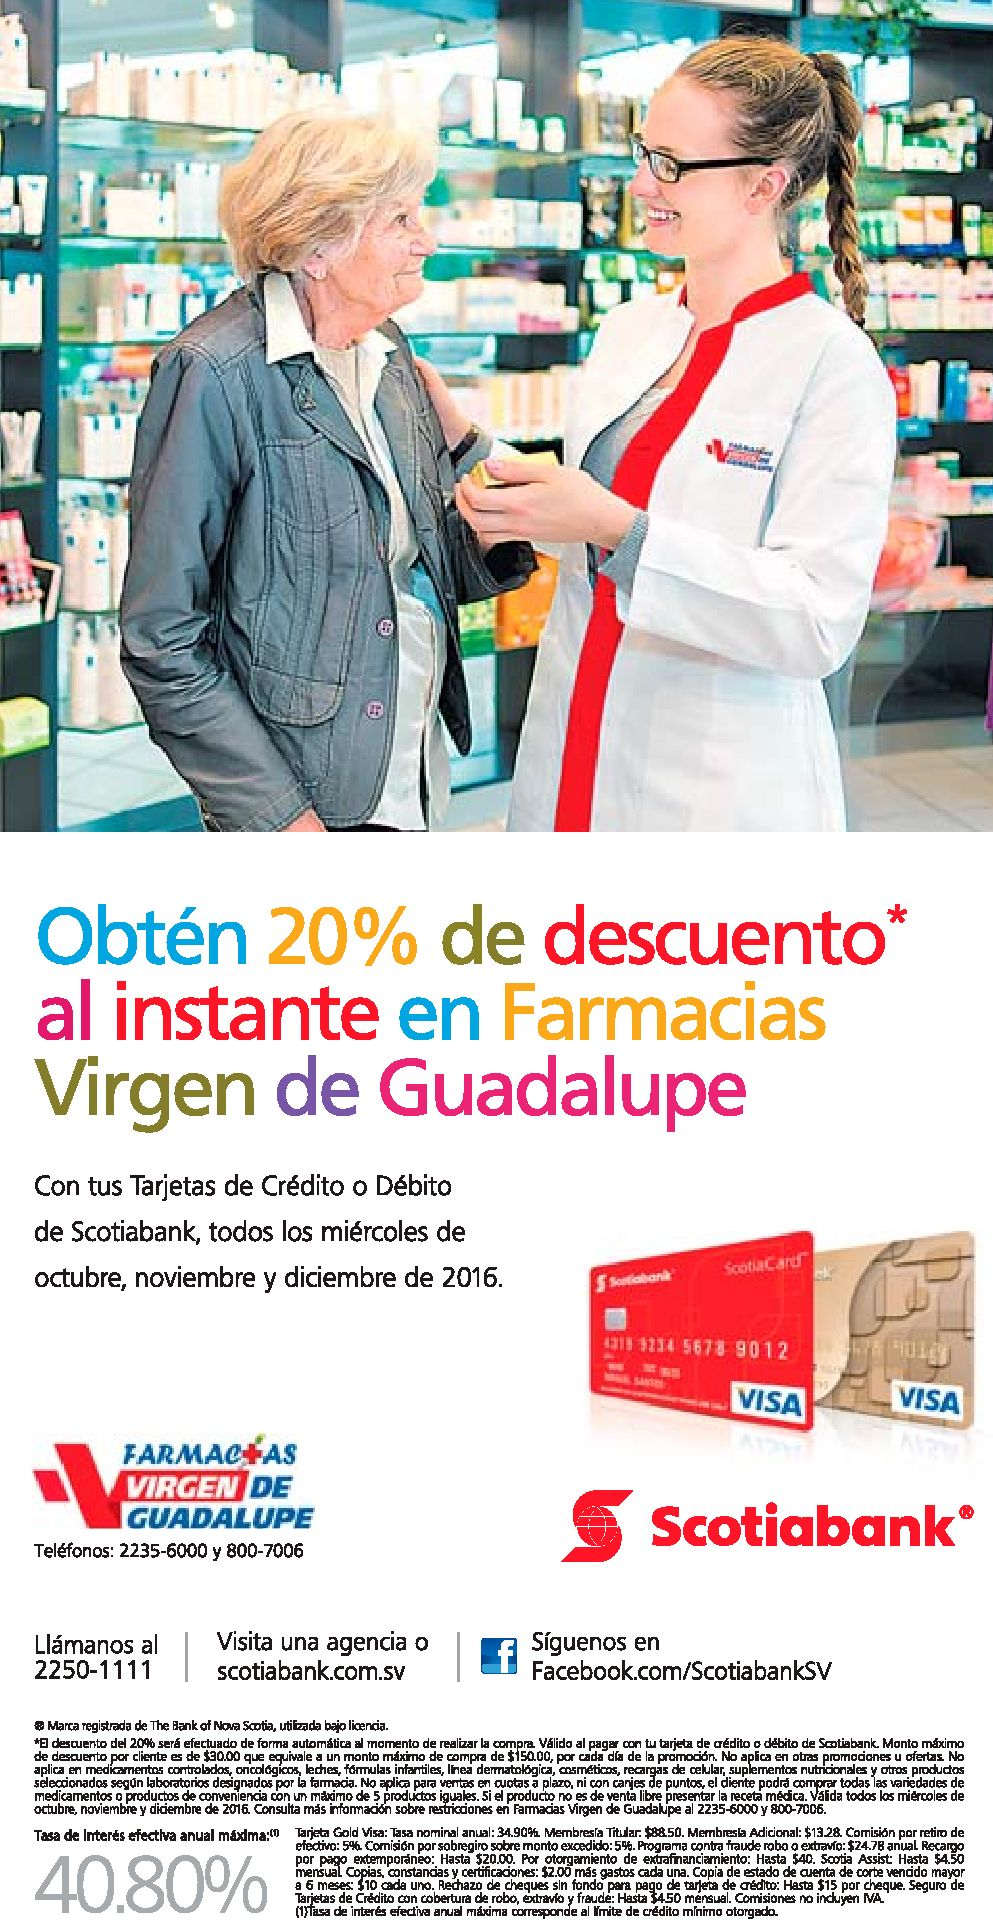 20-off-de-descuentos-en-farmacias-virgen-de-giadalupe-con-scotiabank